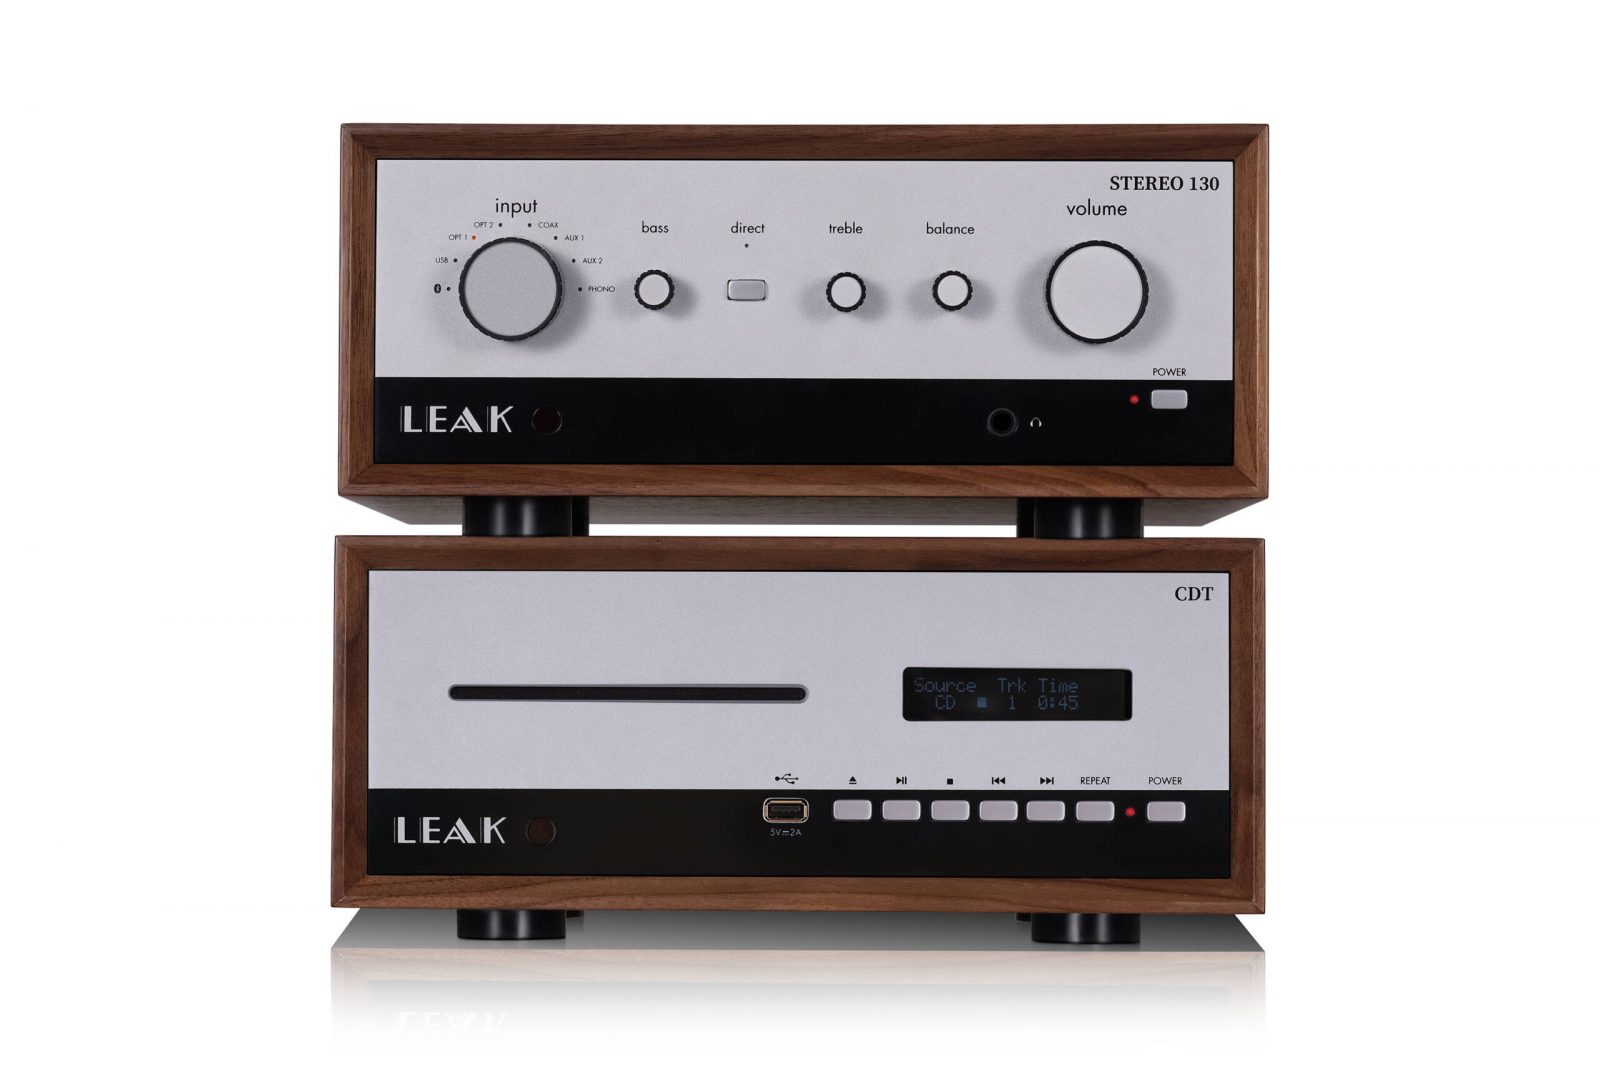 leak stereo 130 leak cdt